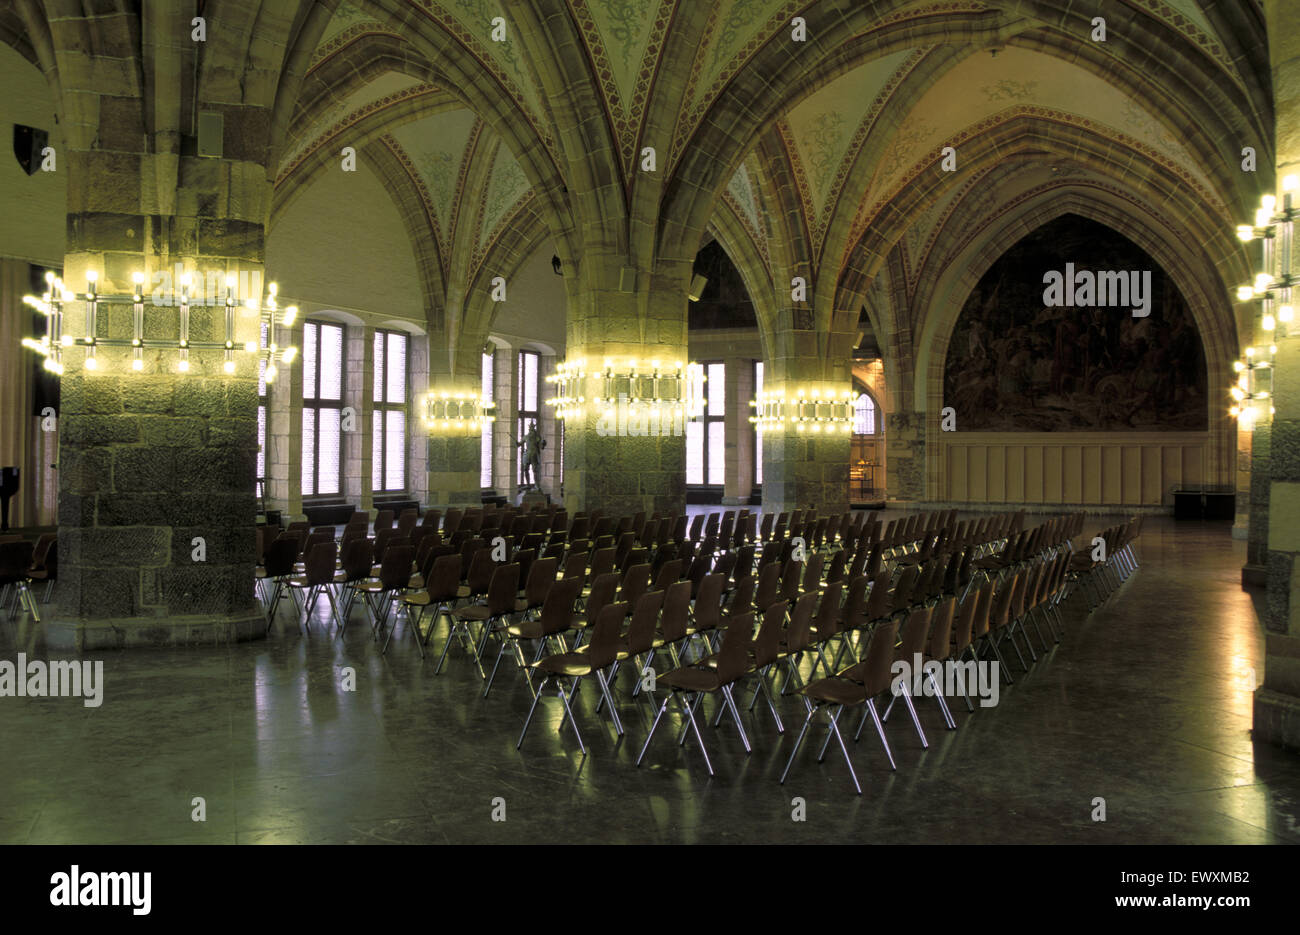 DEU, Germany, Aachen, the Coronation hall at the town hall at the market place.  DEU, Deutschland, Aachen, das Rathaus Stock Photo